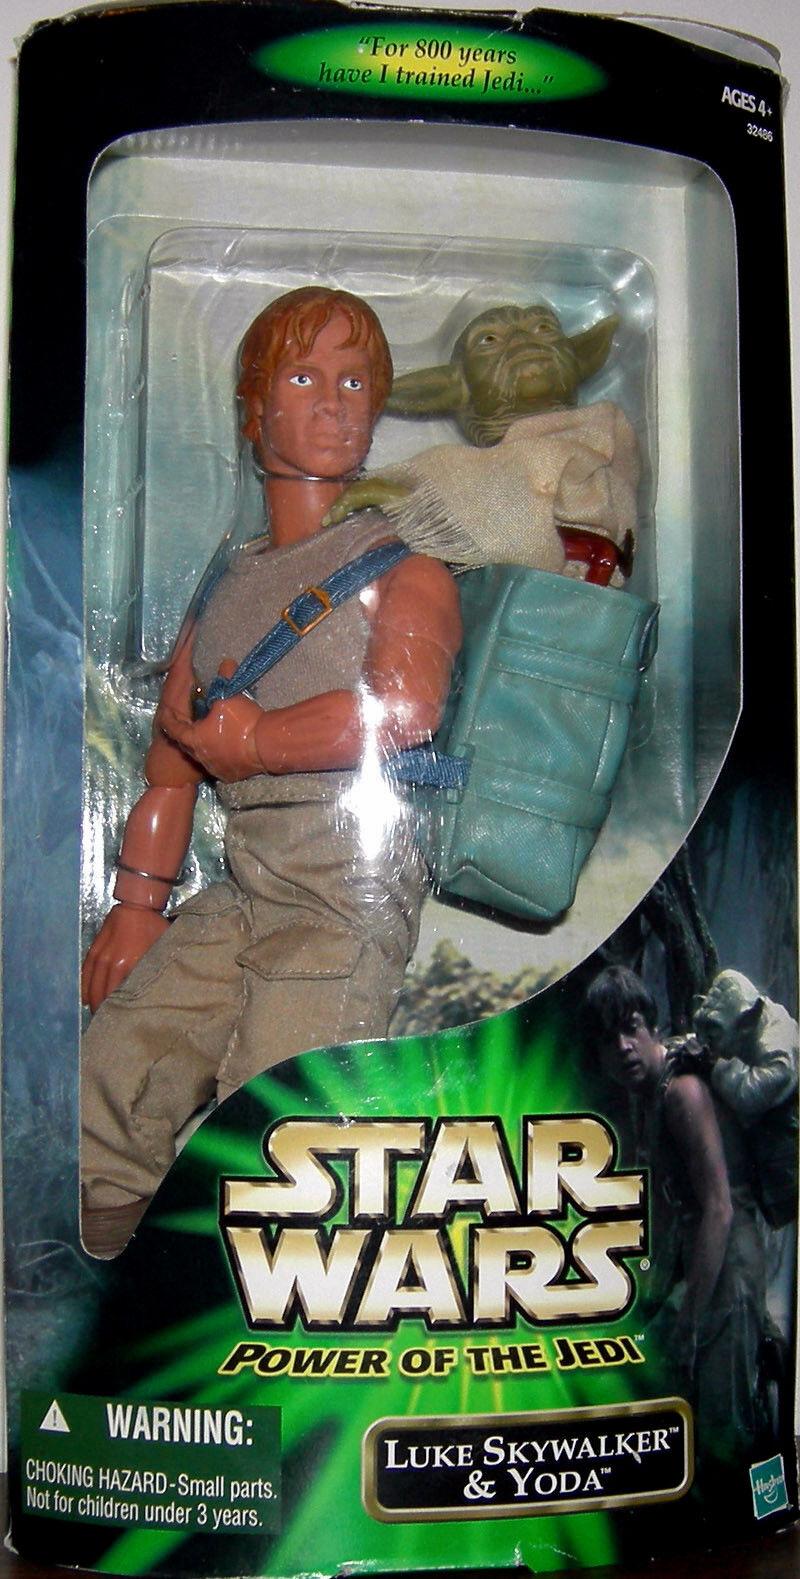 STAR WARS Power of the Jedi Collection__LUKE SKYWALKER 12